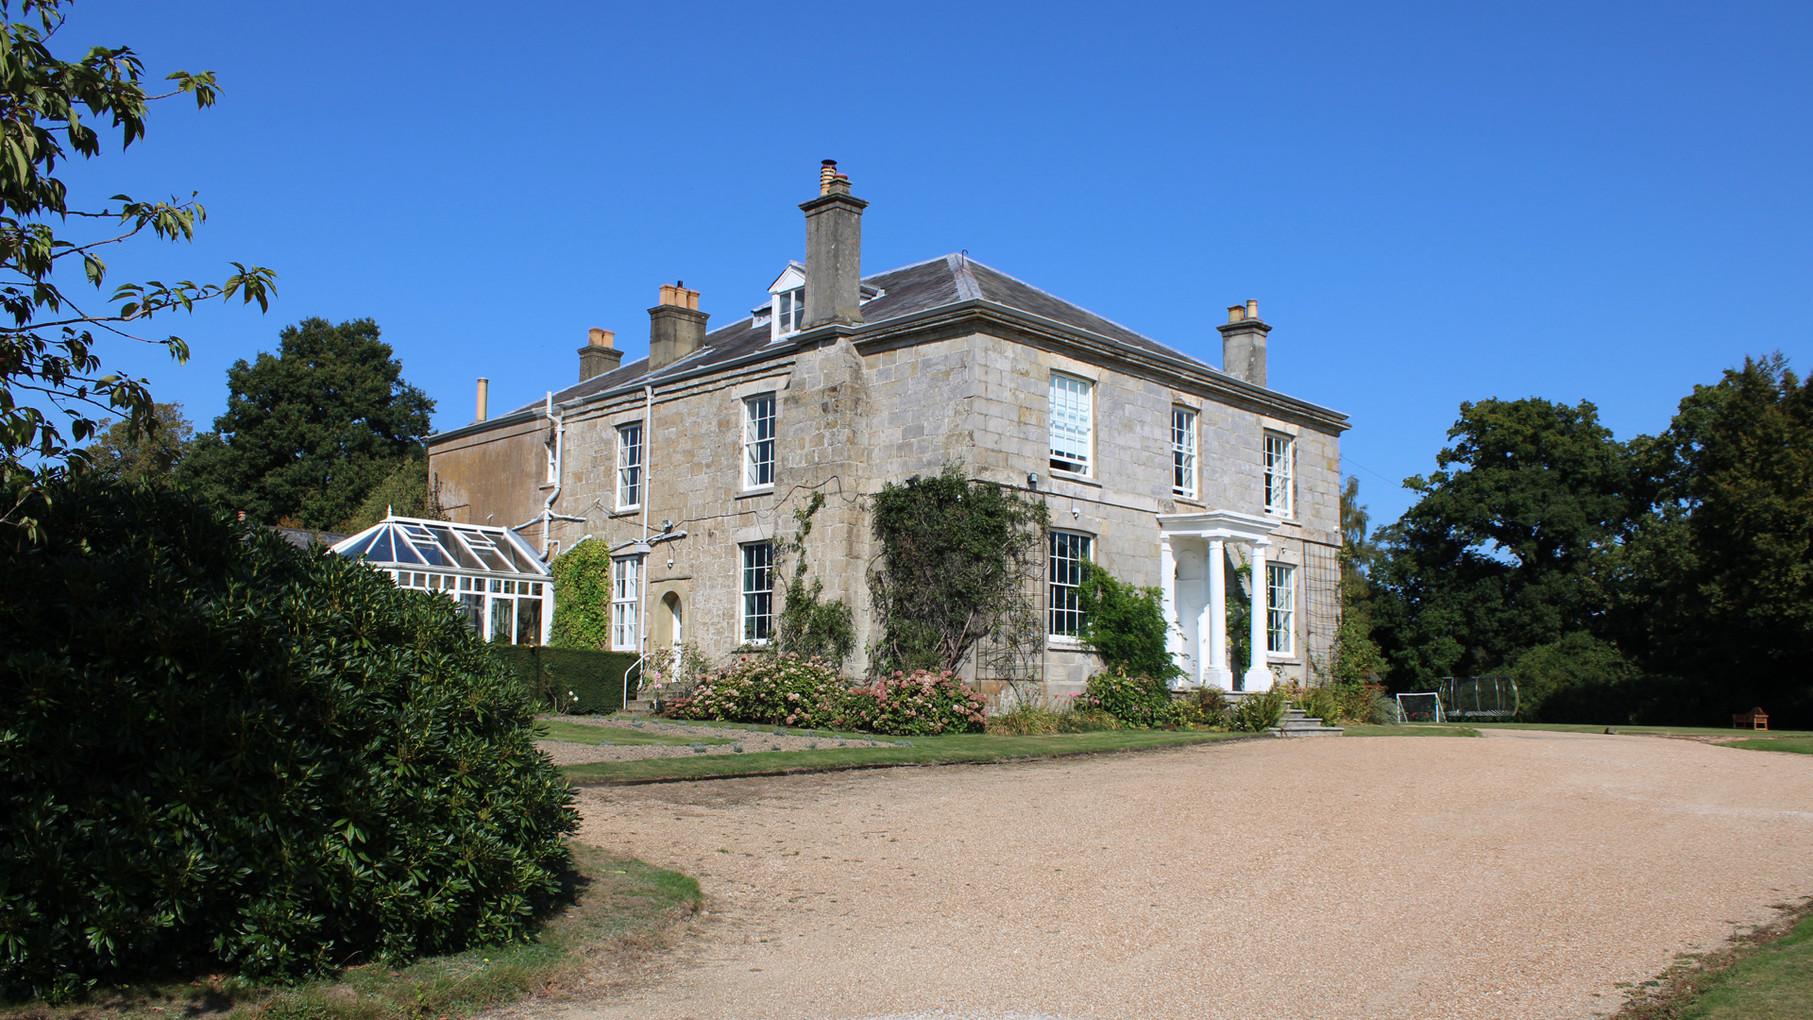 GEORGIAN MANOR HOUSE